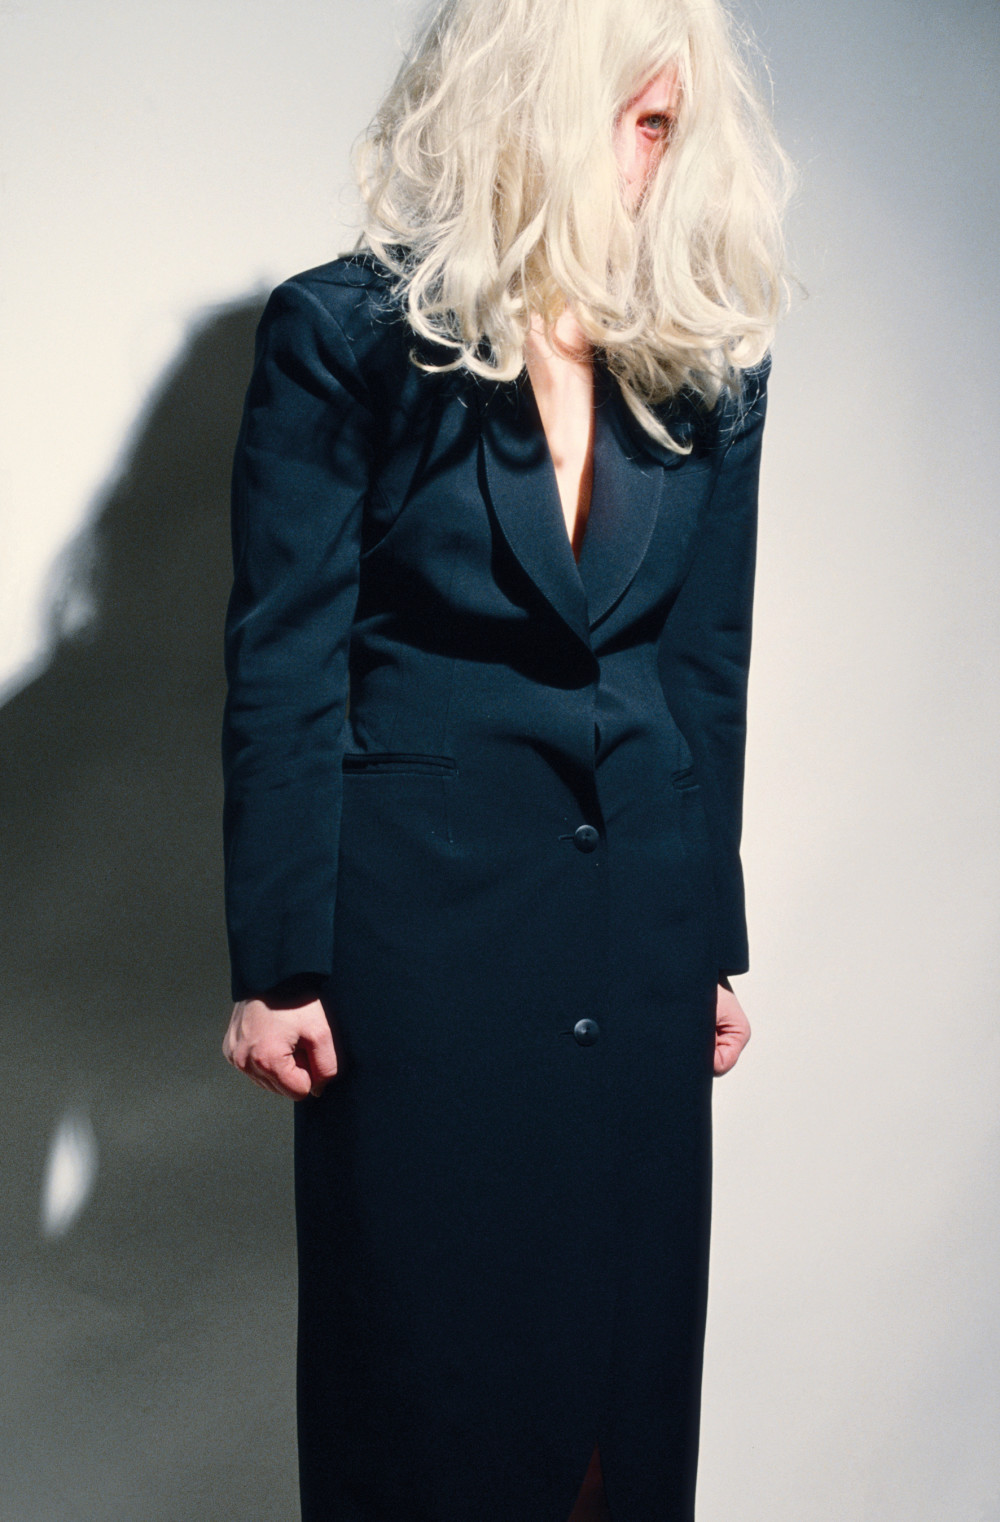 cindy-sherman-untitled-122-1983.jpg